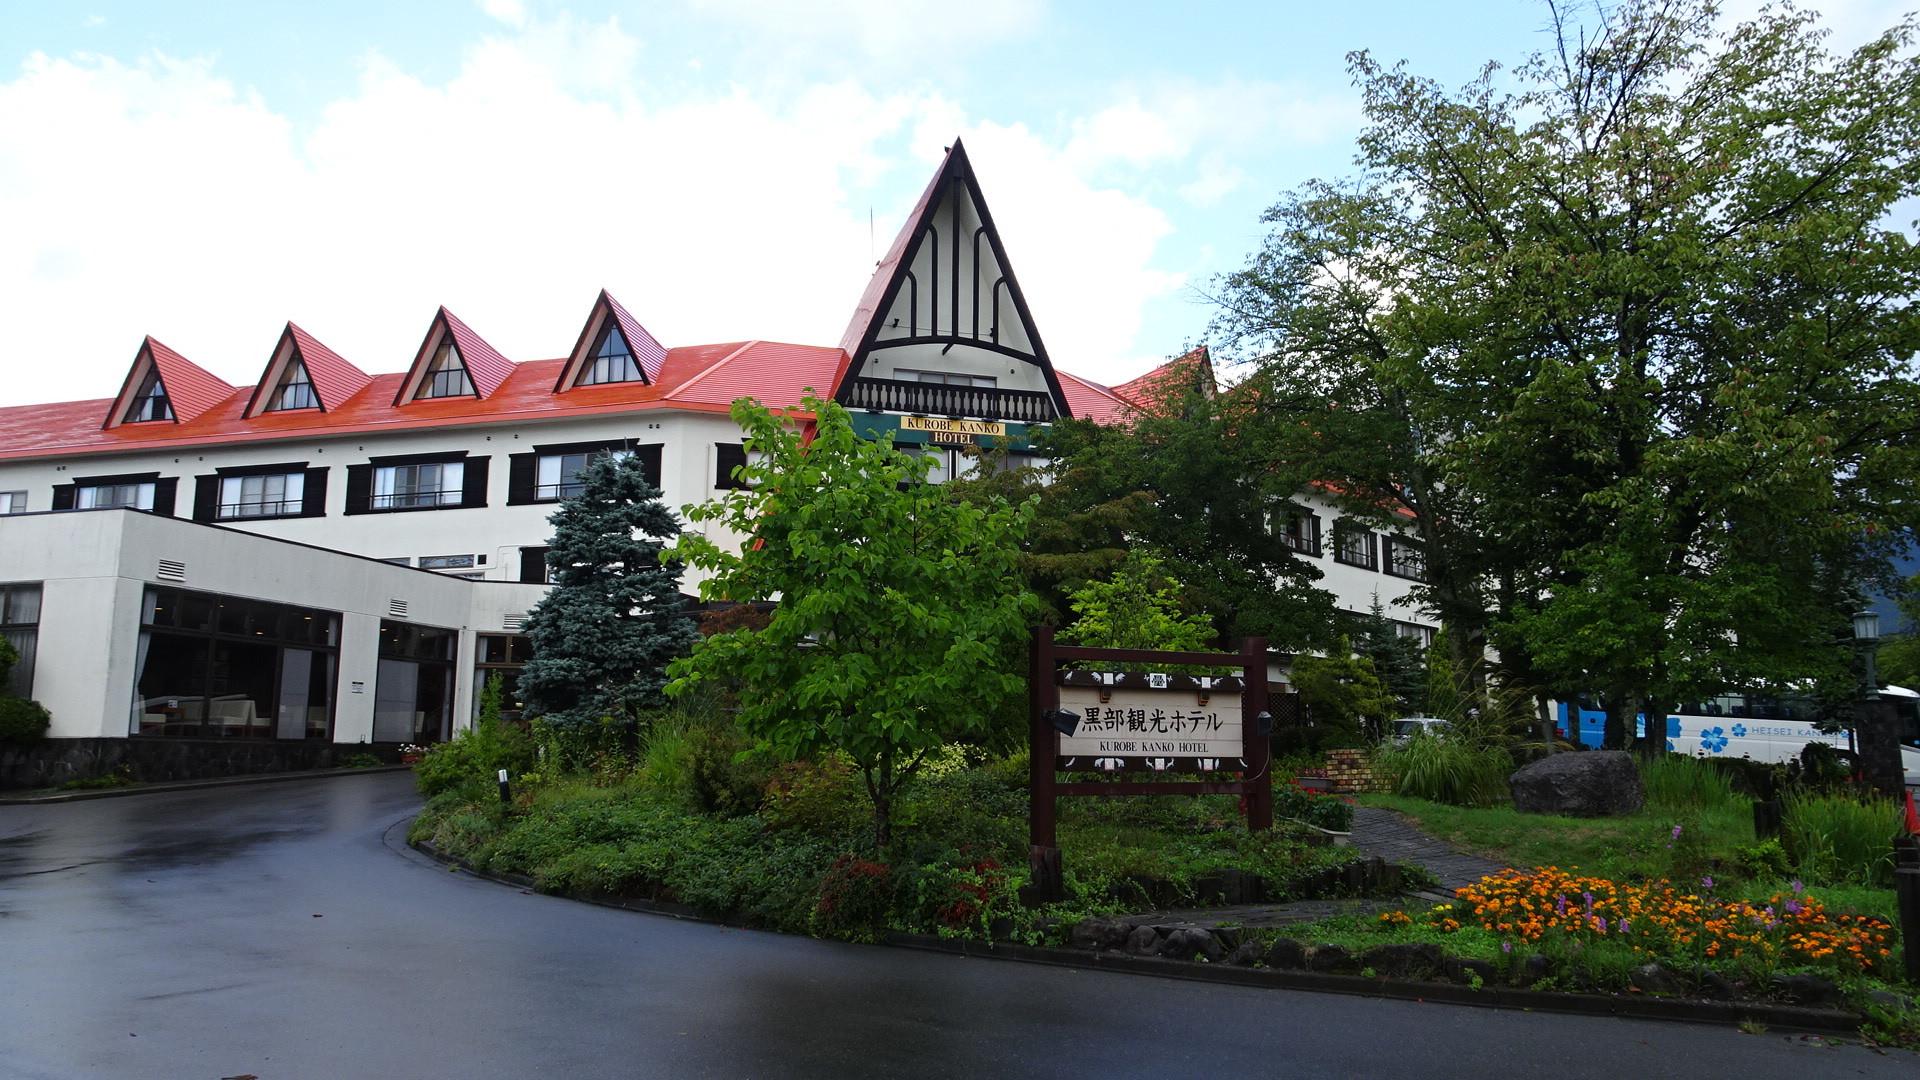 黒部観光ホテル 施設・部屋編 (2018年9月)